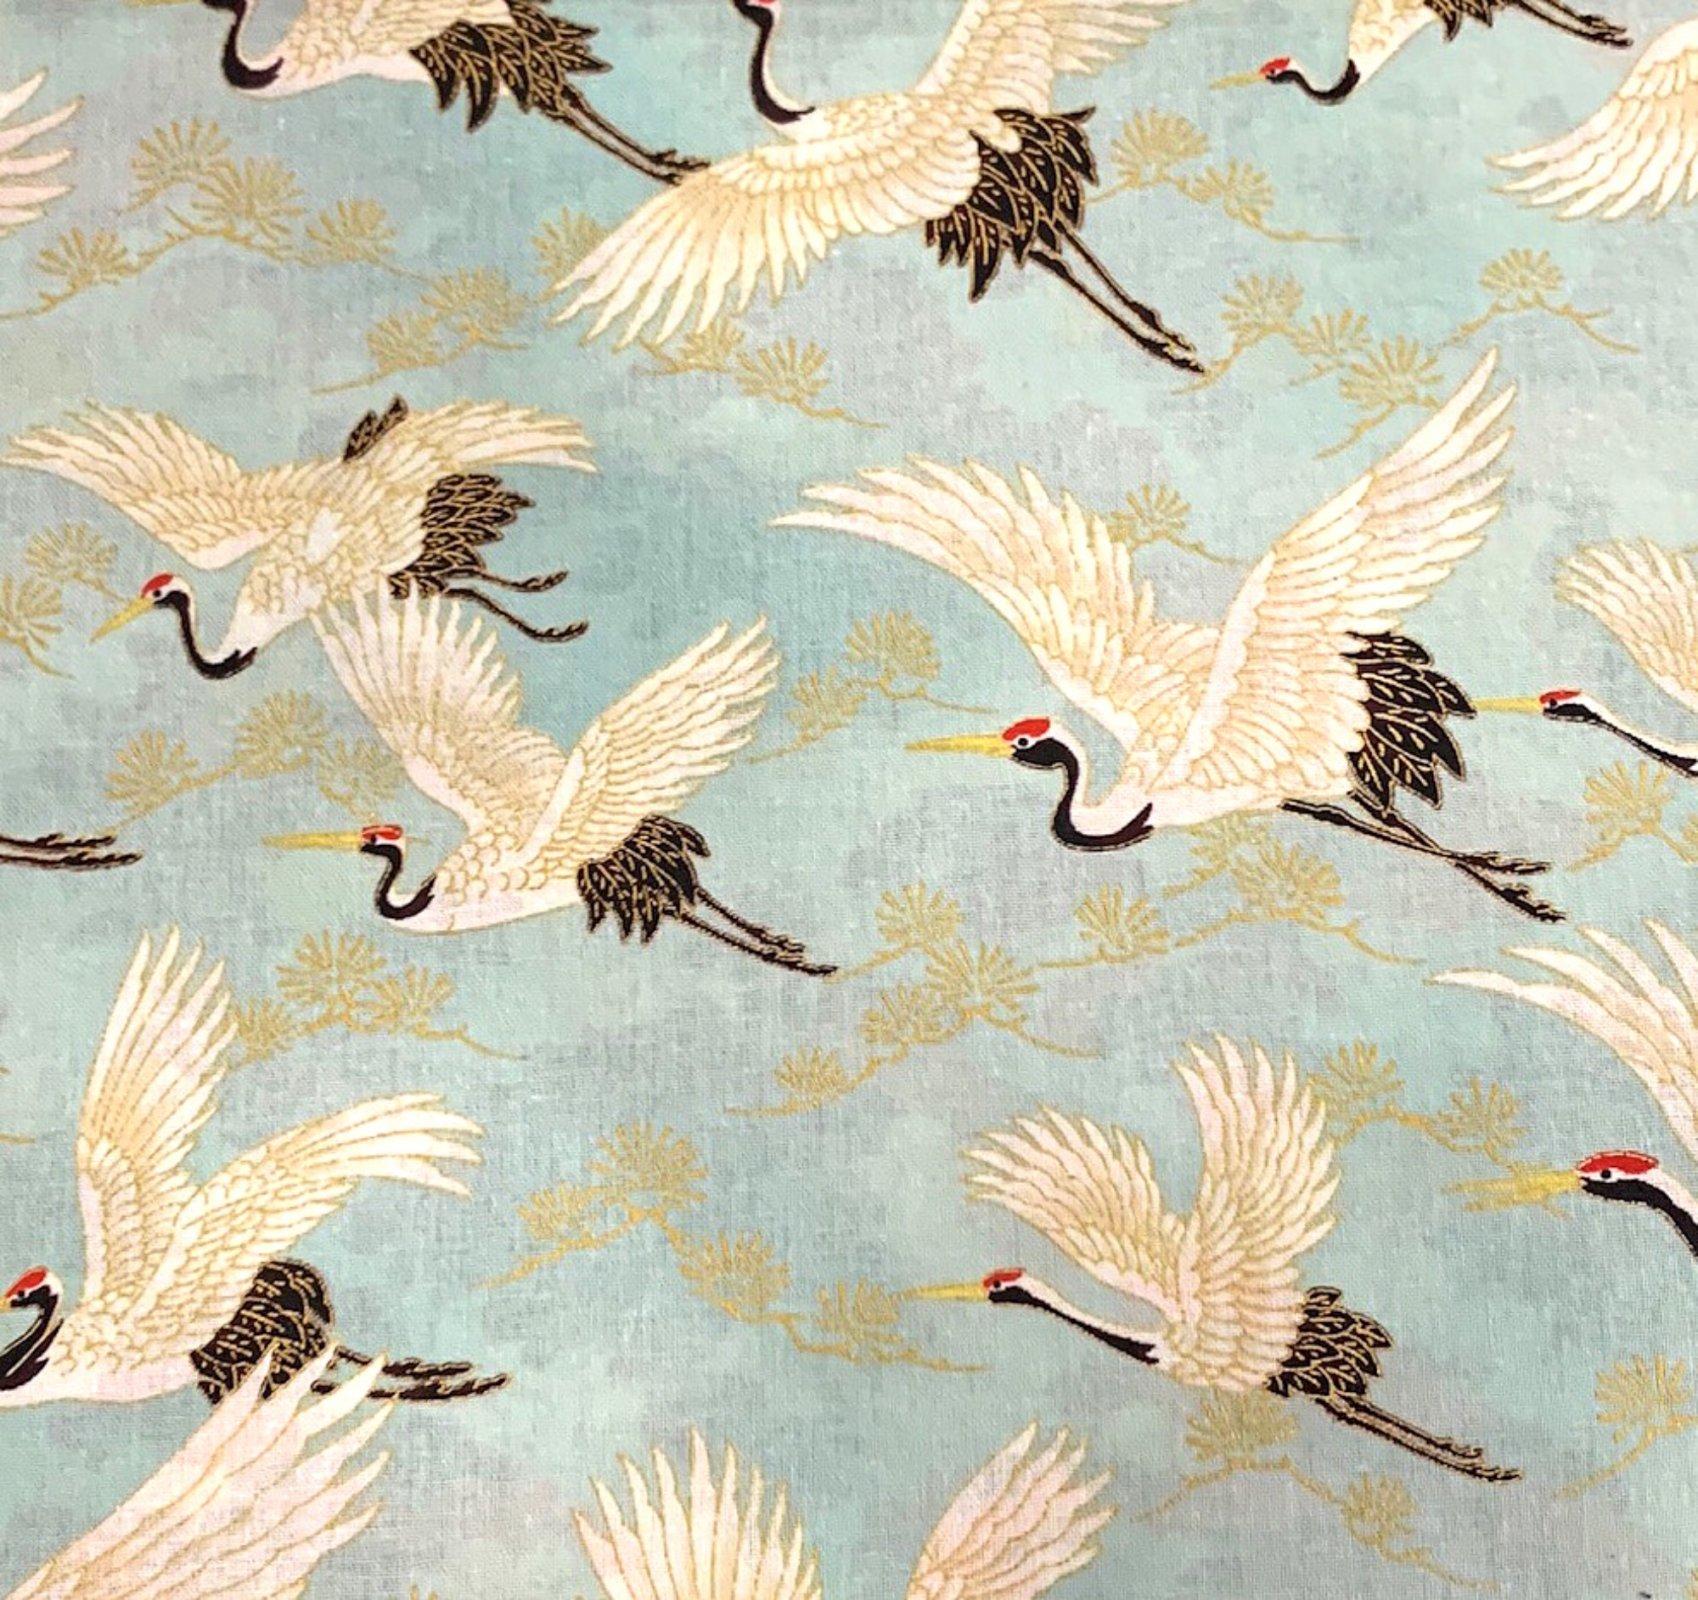 COMING SOON! Japanese Asian Cranes Water Birds Obi Print Cotton Quilt Fabric